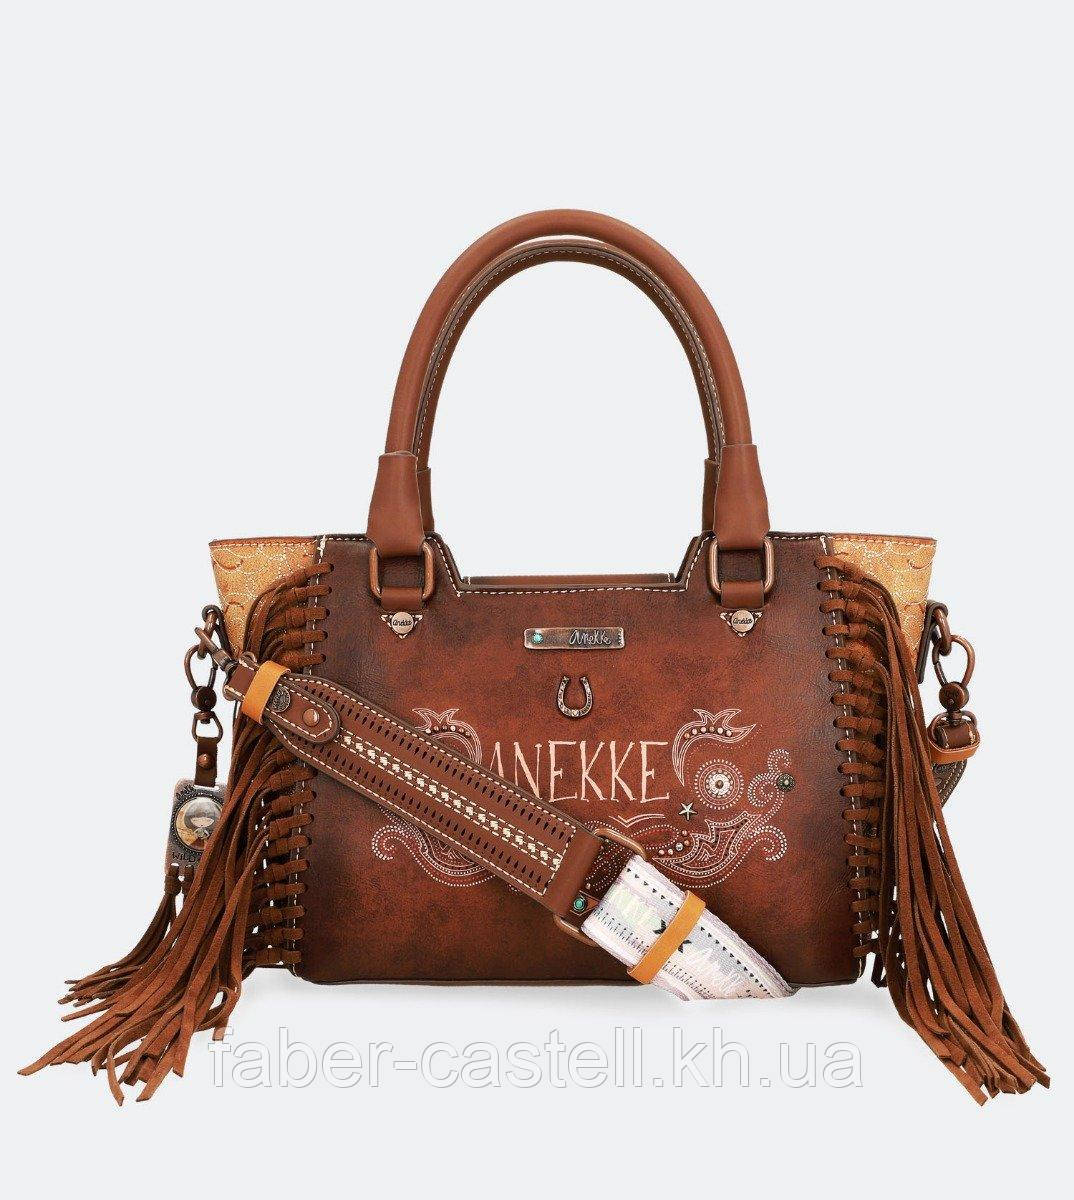 Сумка женская на плечо Anekke Arizona Handbag with brown tassels, 30701-90